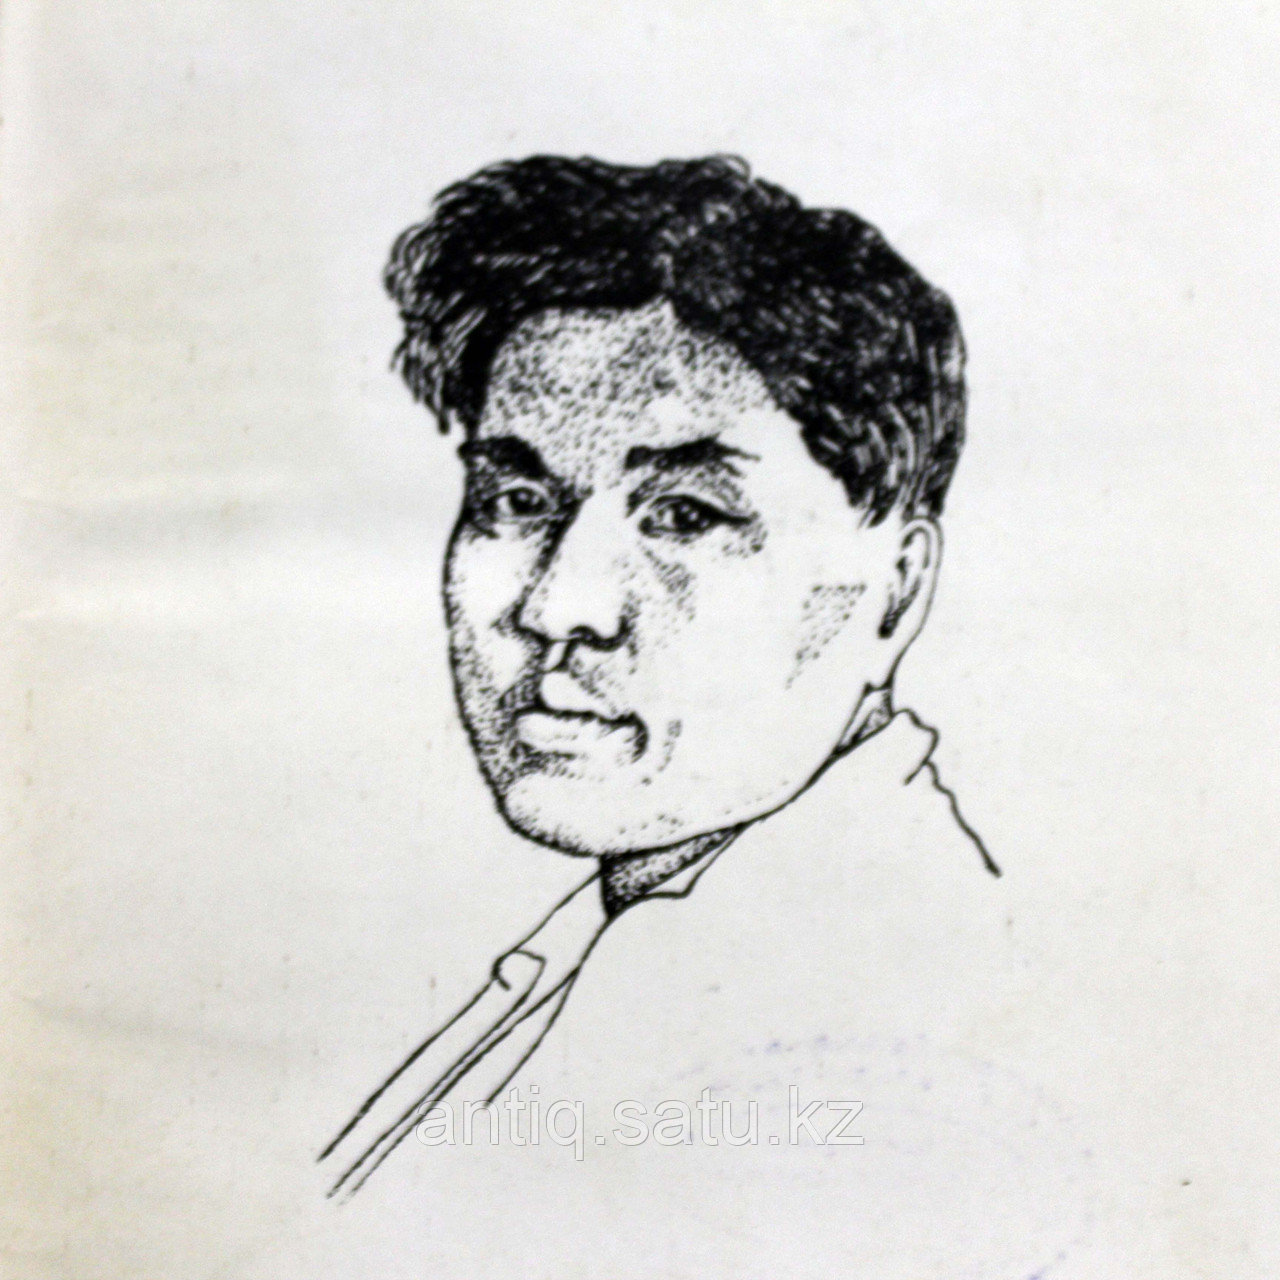 РОМАН «АДАСКАНДАР» Автор - Сабит Муканов (1900-1973). - фото 3